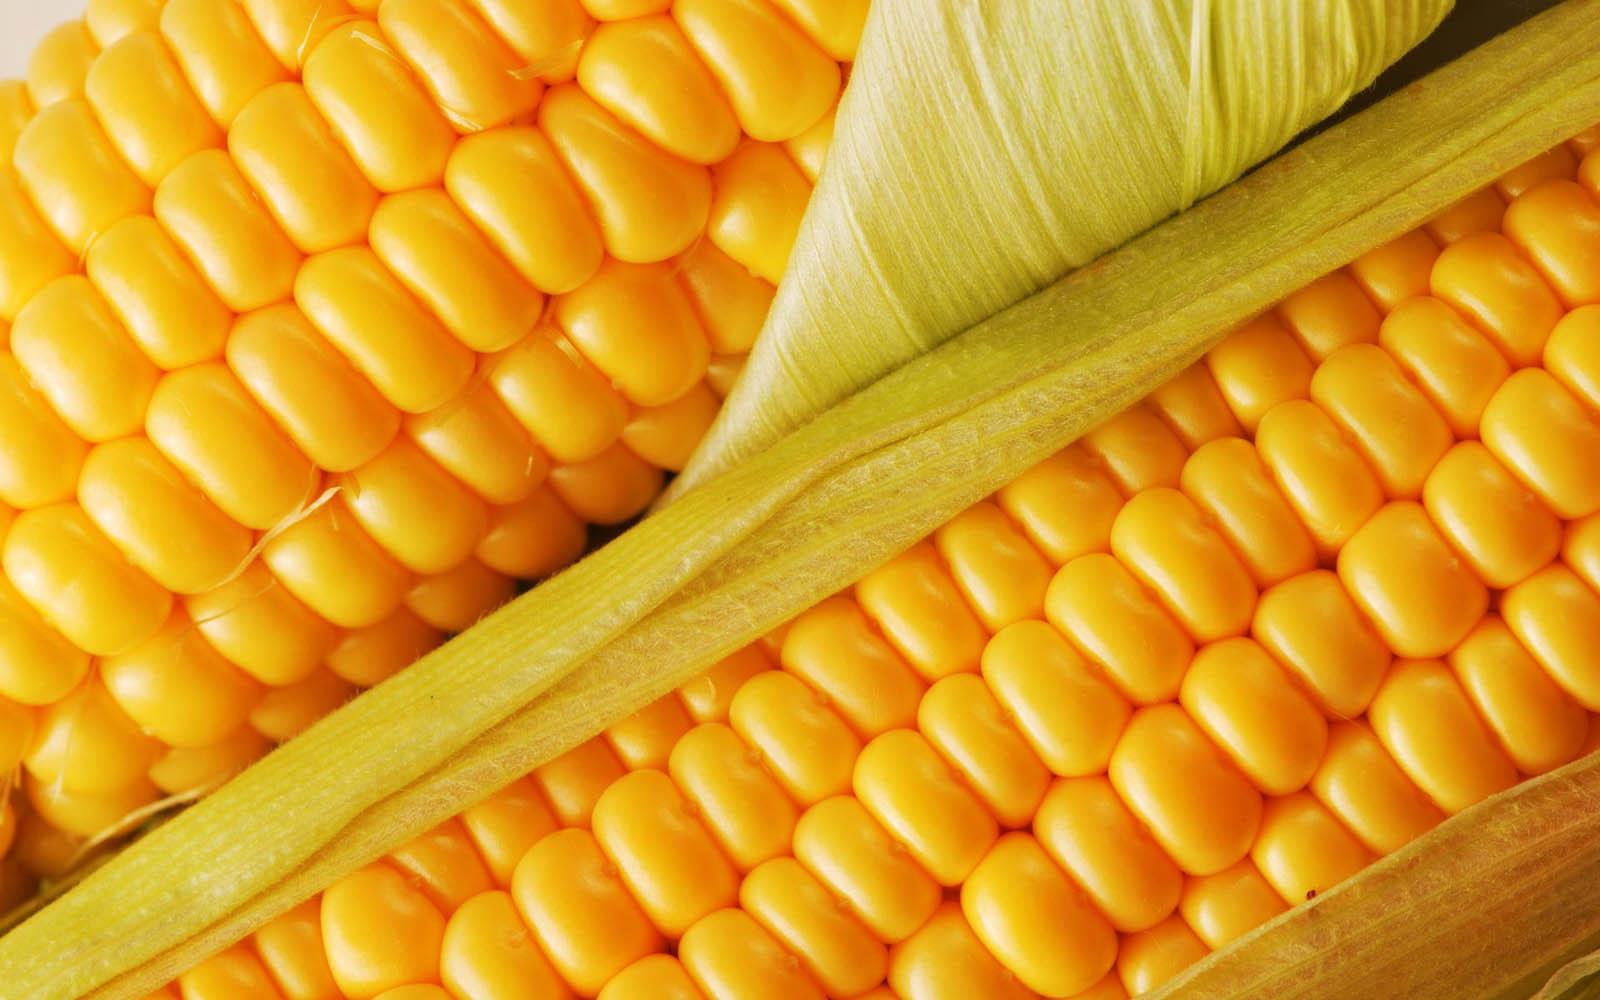 Maize Wallpaper For Presentation: Desktop Wallpaper